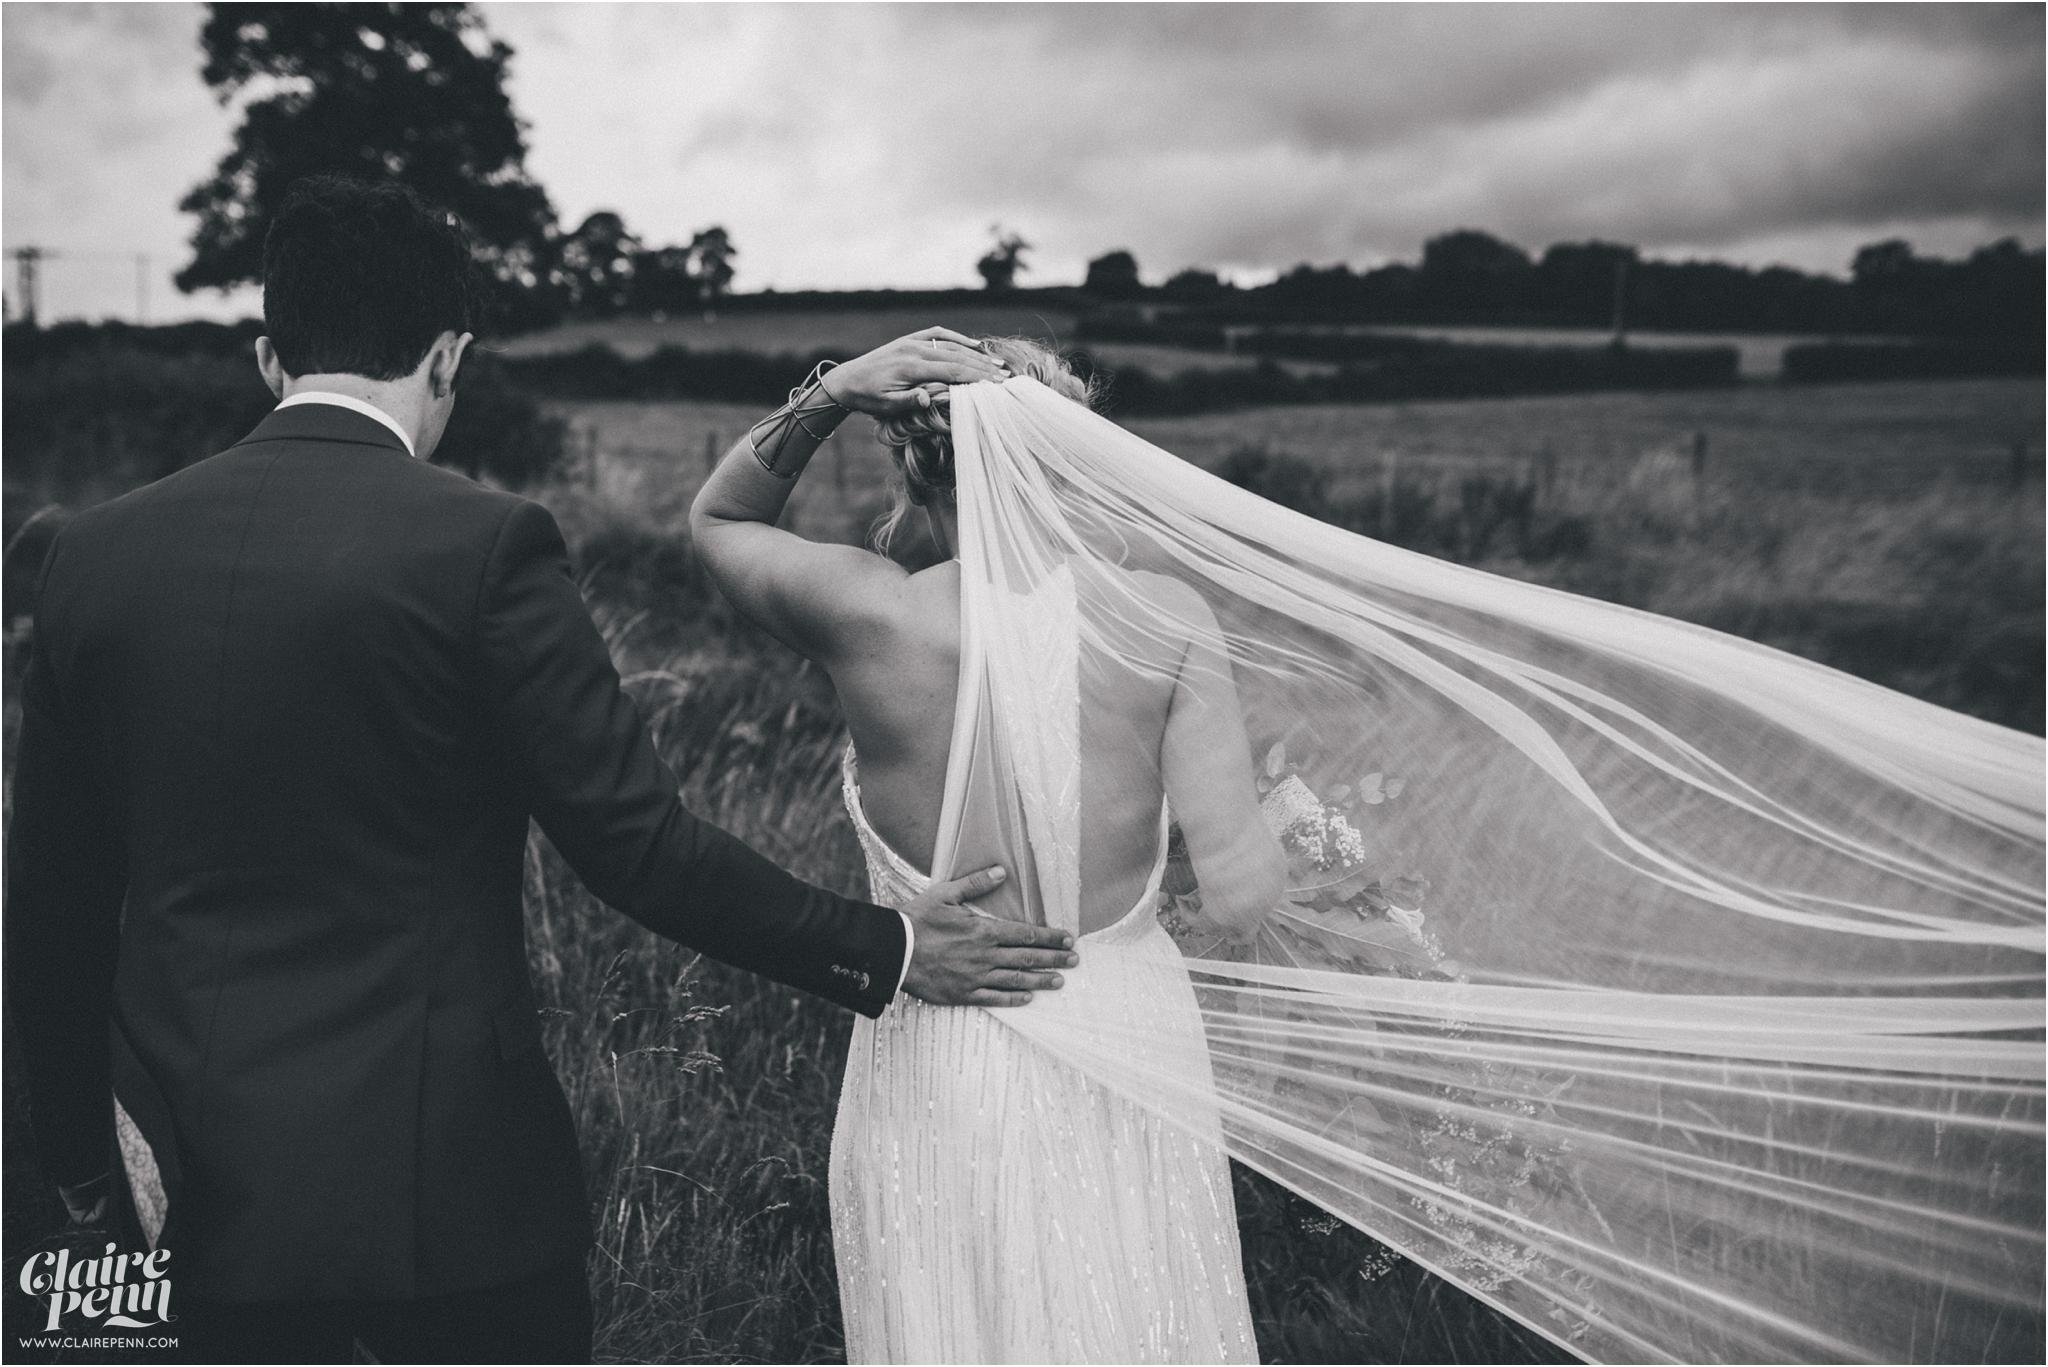 Tower Hills Barn wedding North Wales Llangollen_0087.jpg